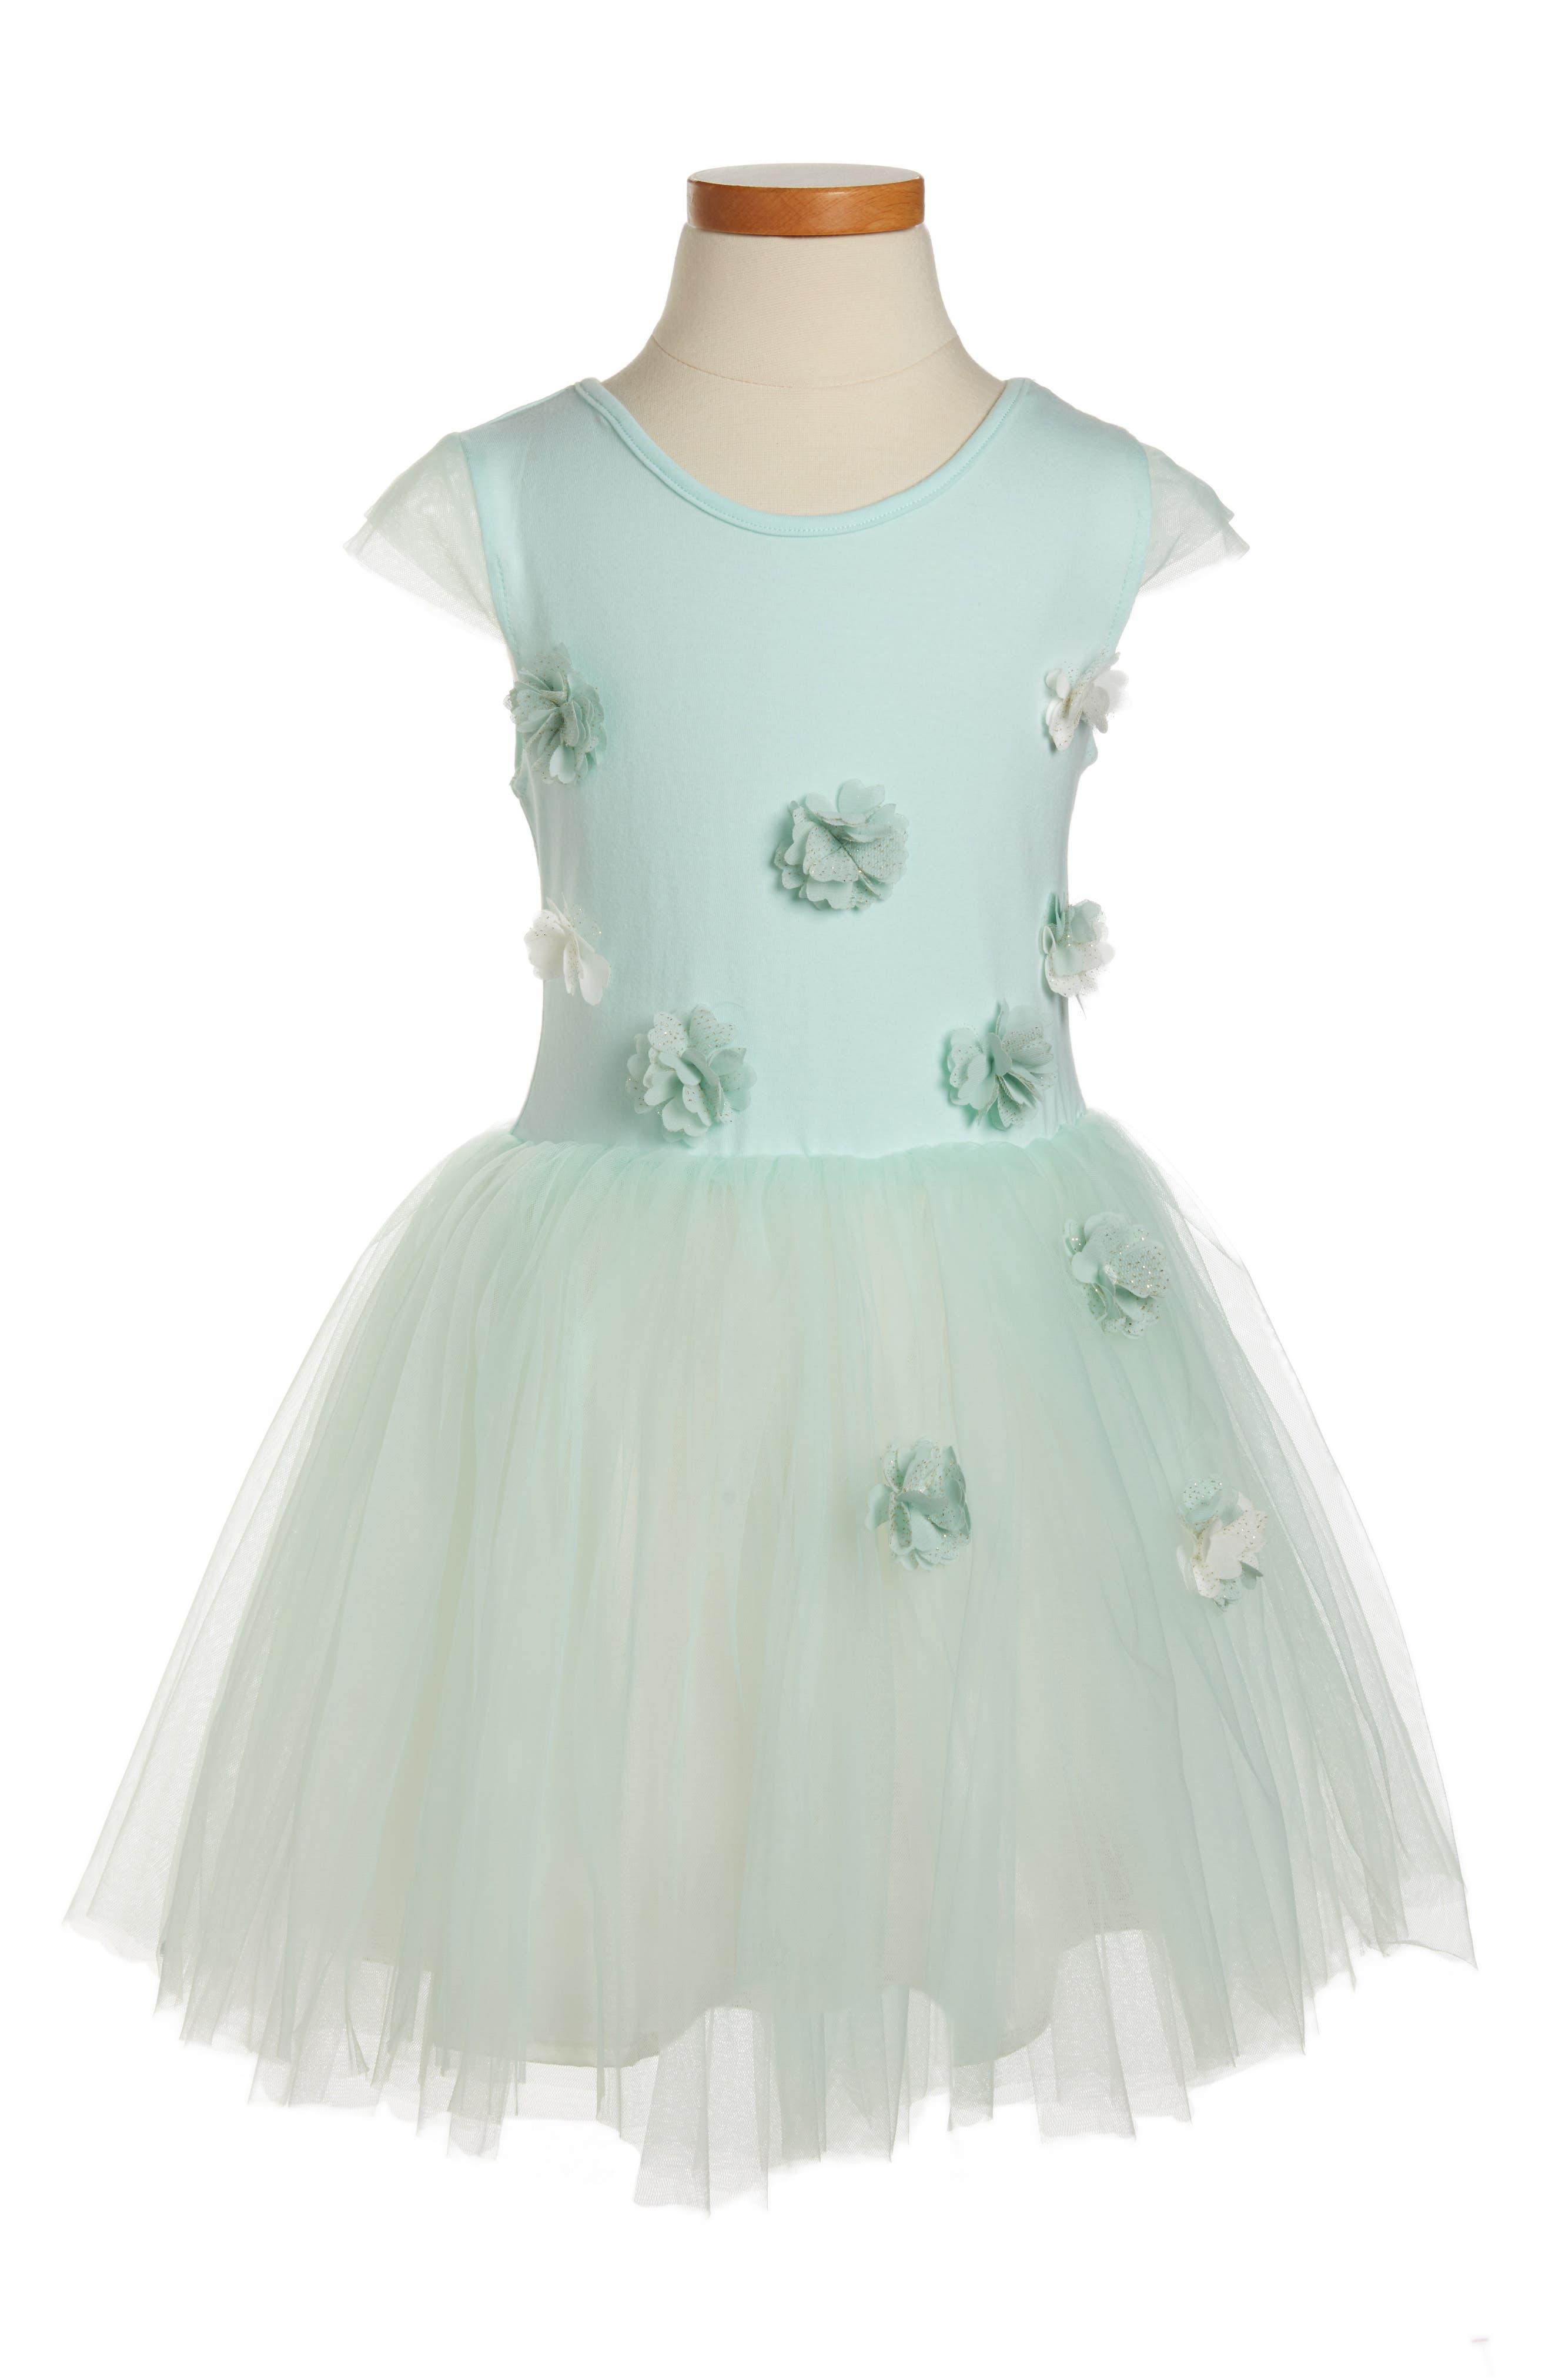 Main Image - Popatu Flower Tulle Dress (Toddler Girls, Little Girls & Big Girls)